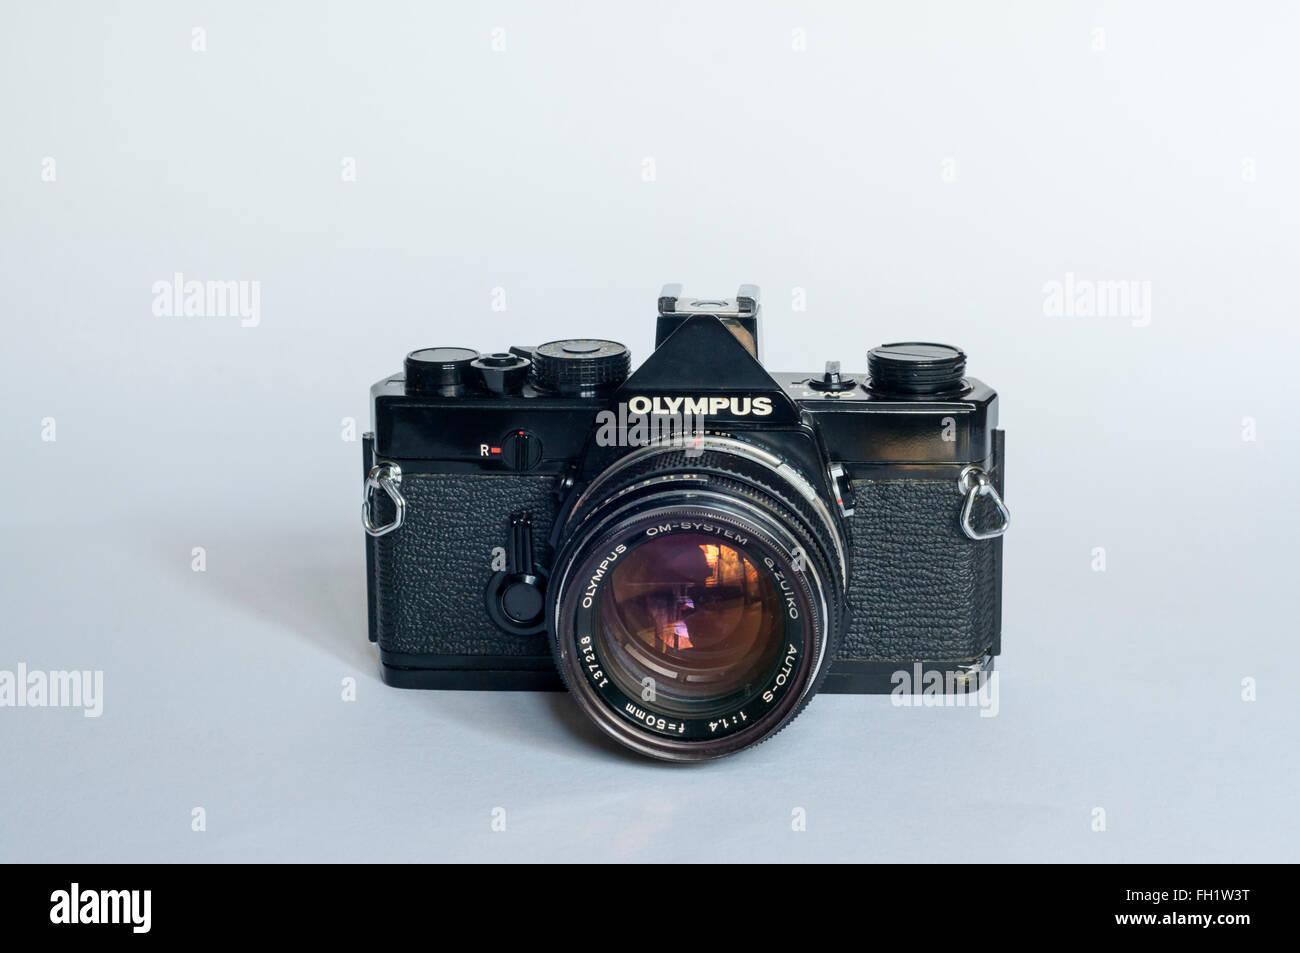 An Olympus OM1 single lens reflex film camera. - Stock Image